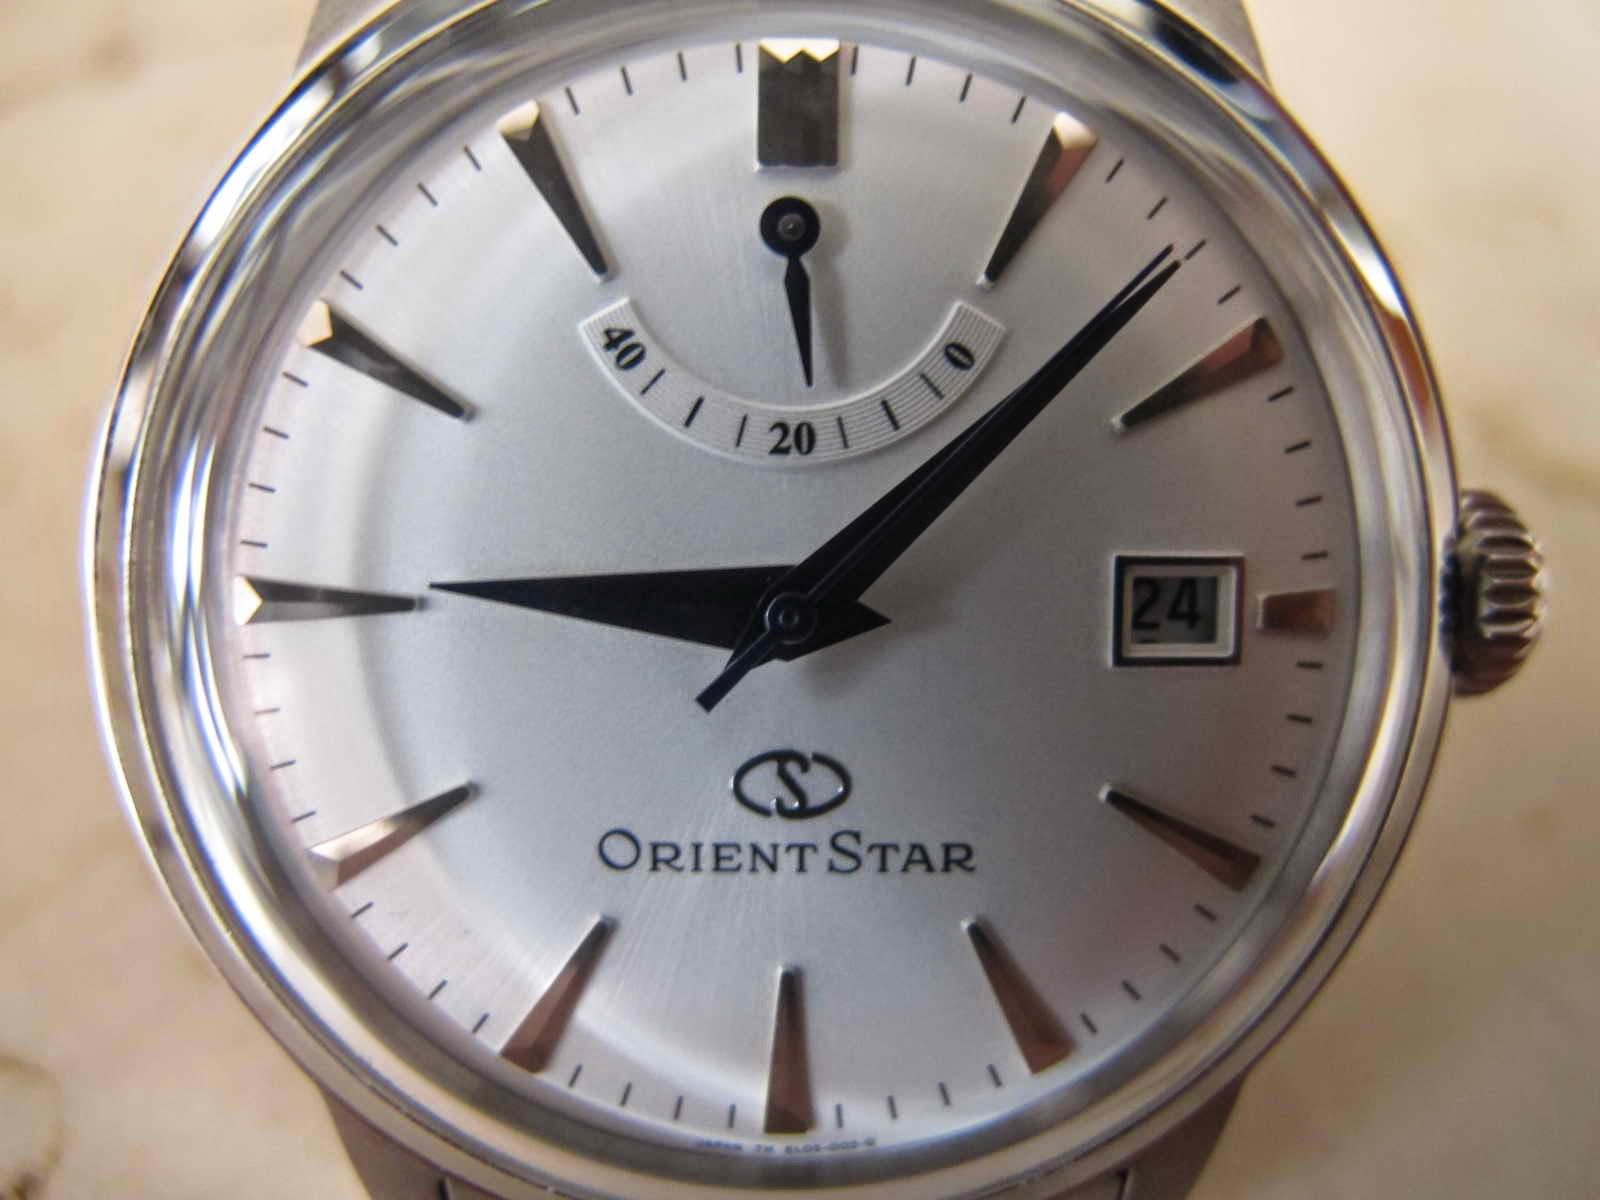 Kondisi ORIENT STAR ini Like Brand New Watch lengkap dengan box dan warranty card Cocok untuk Anda yang sedang mencari jam tangan yang terdapat